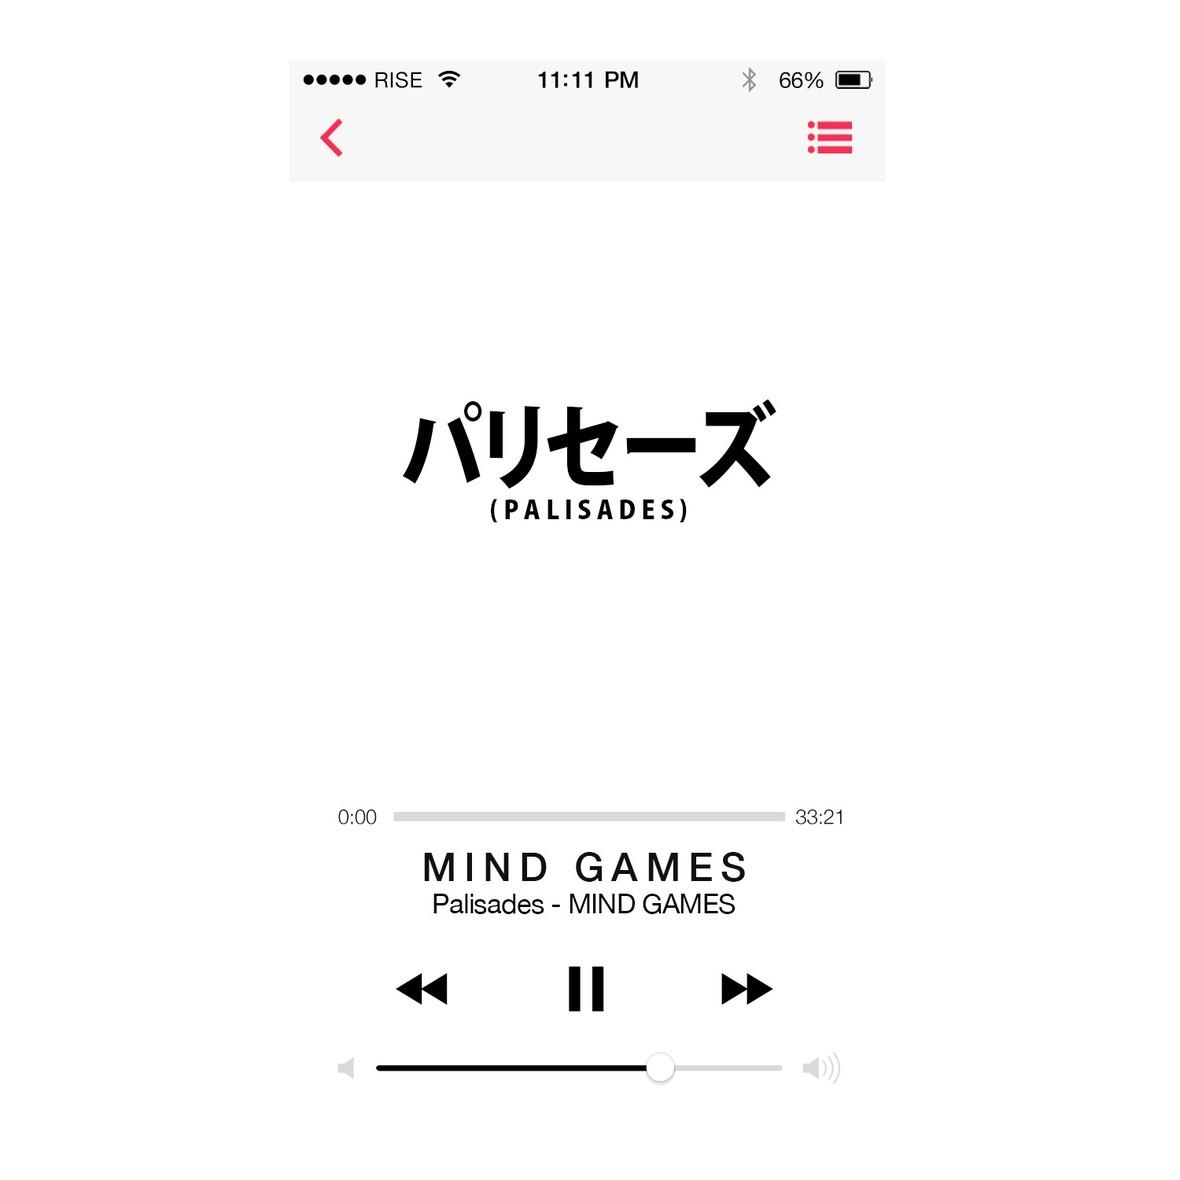 palisades-mind-games